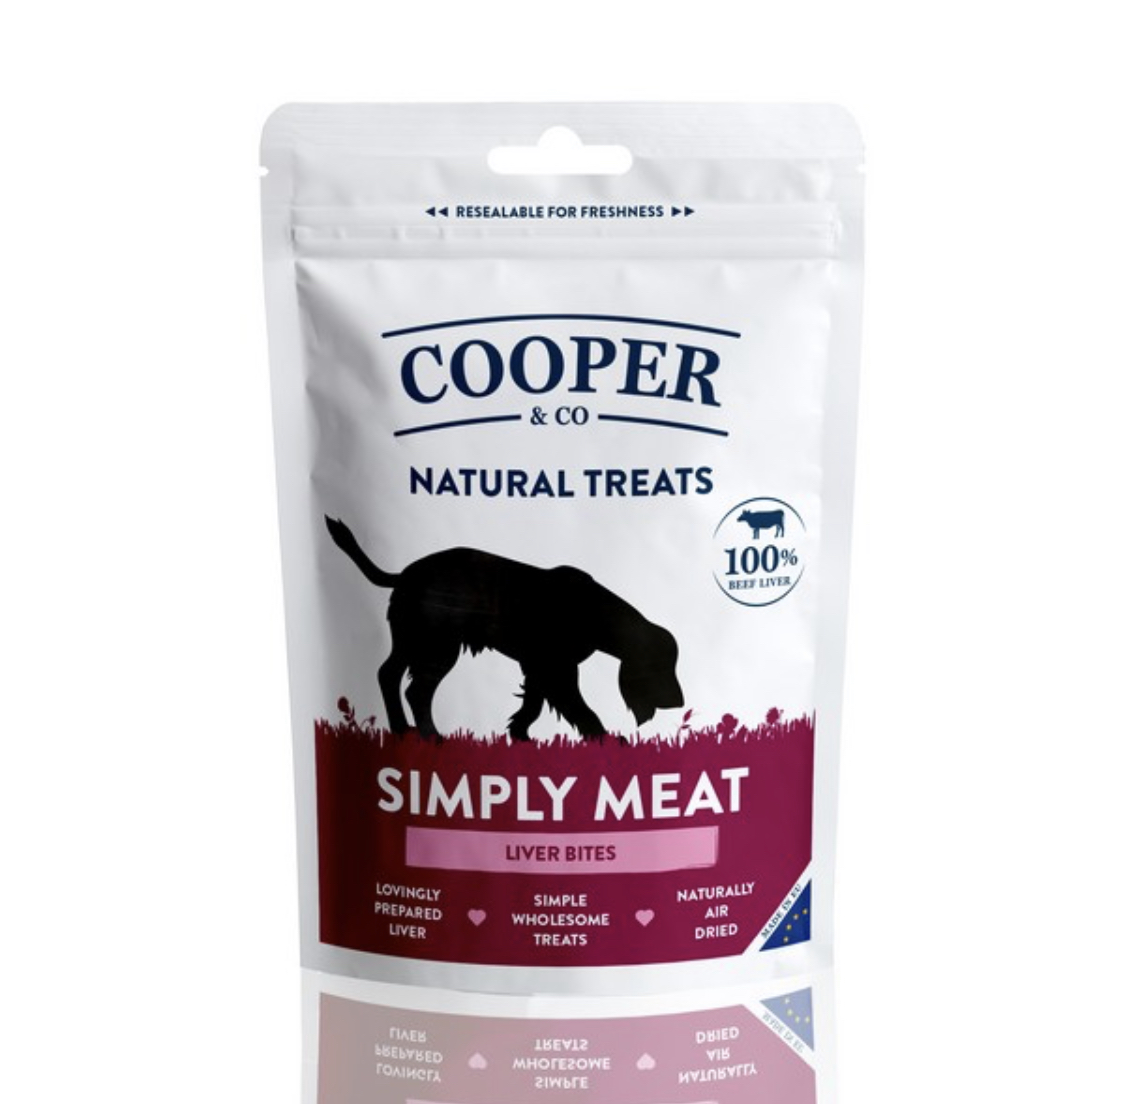 Cooper & Co Liver Bites